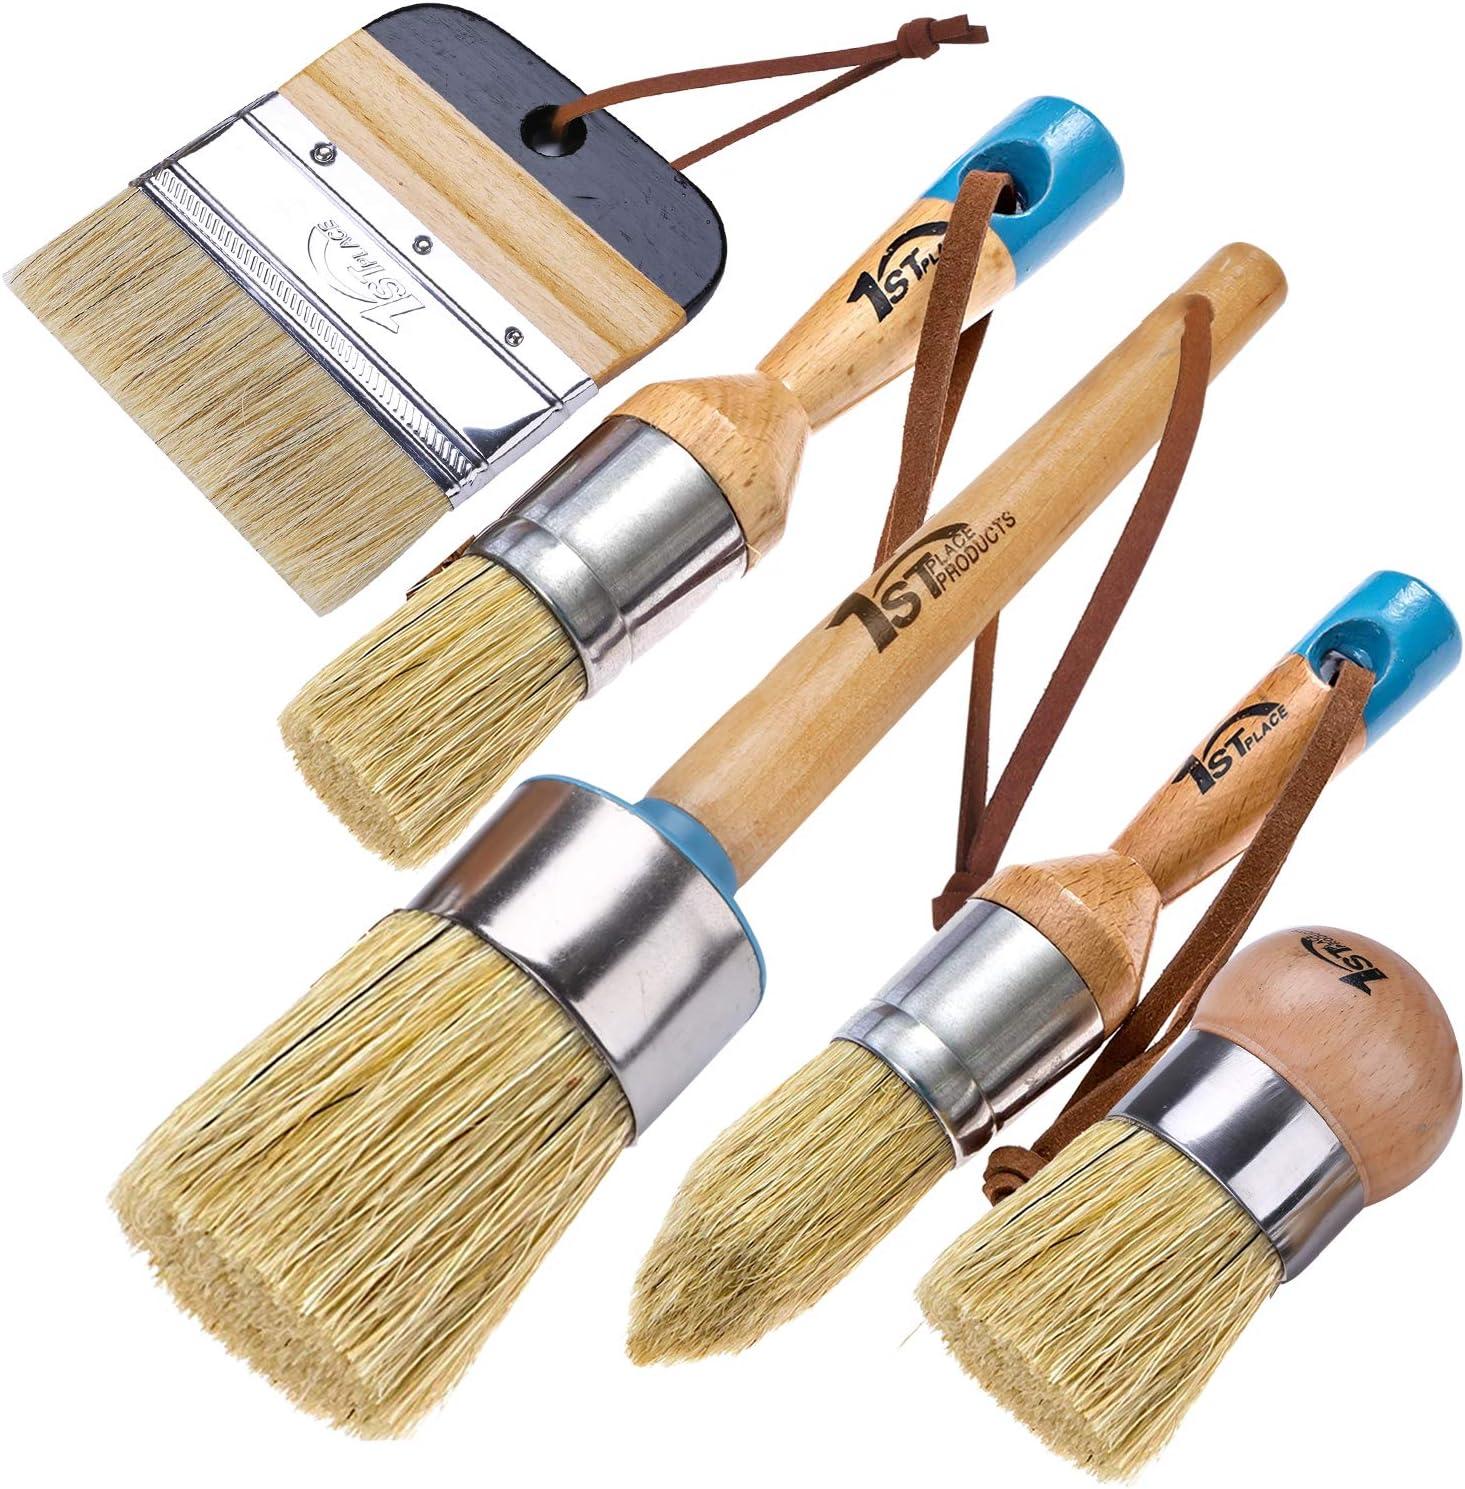 3 Brushes 2 Piece Brush Set /& 4 Flat Brush 1st Place Ultra Chalk /& Wax Natural Bristle Brush Set